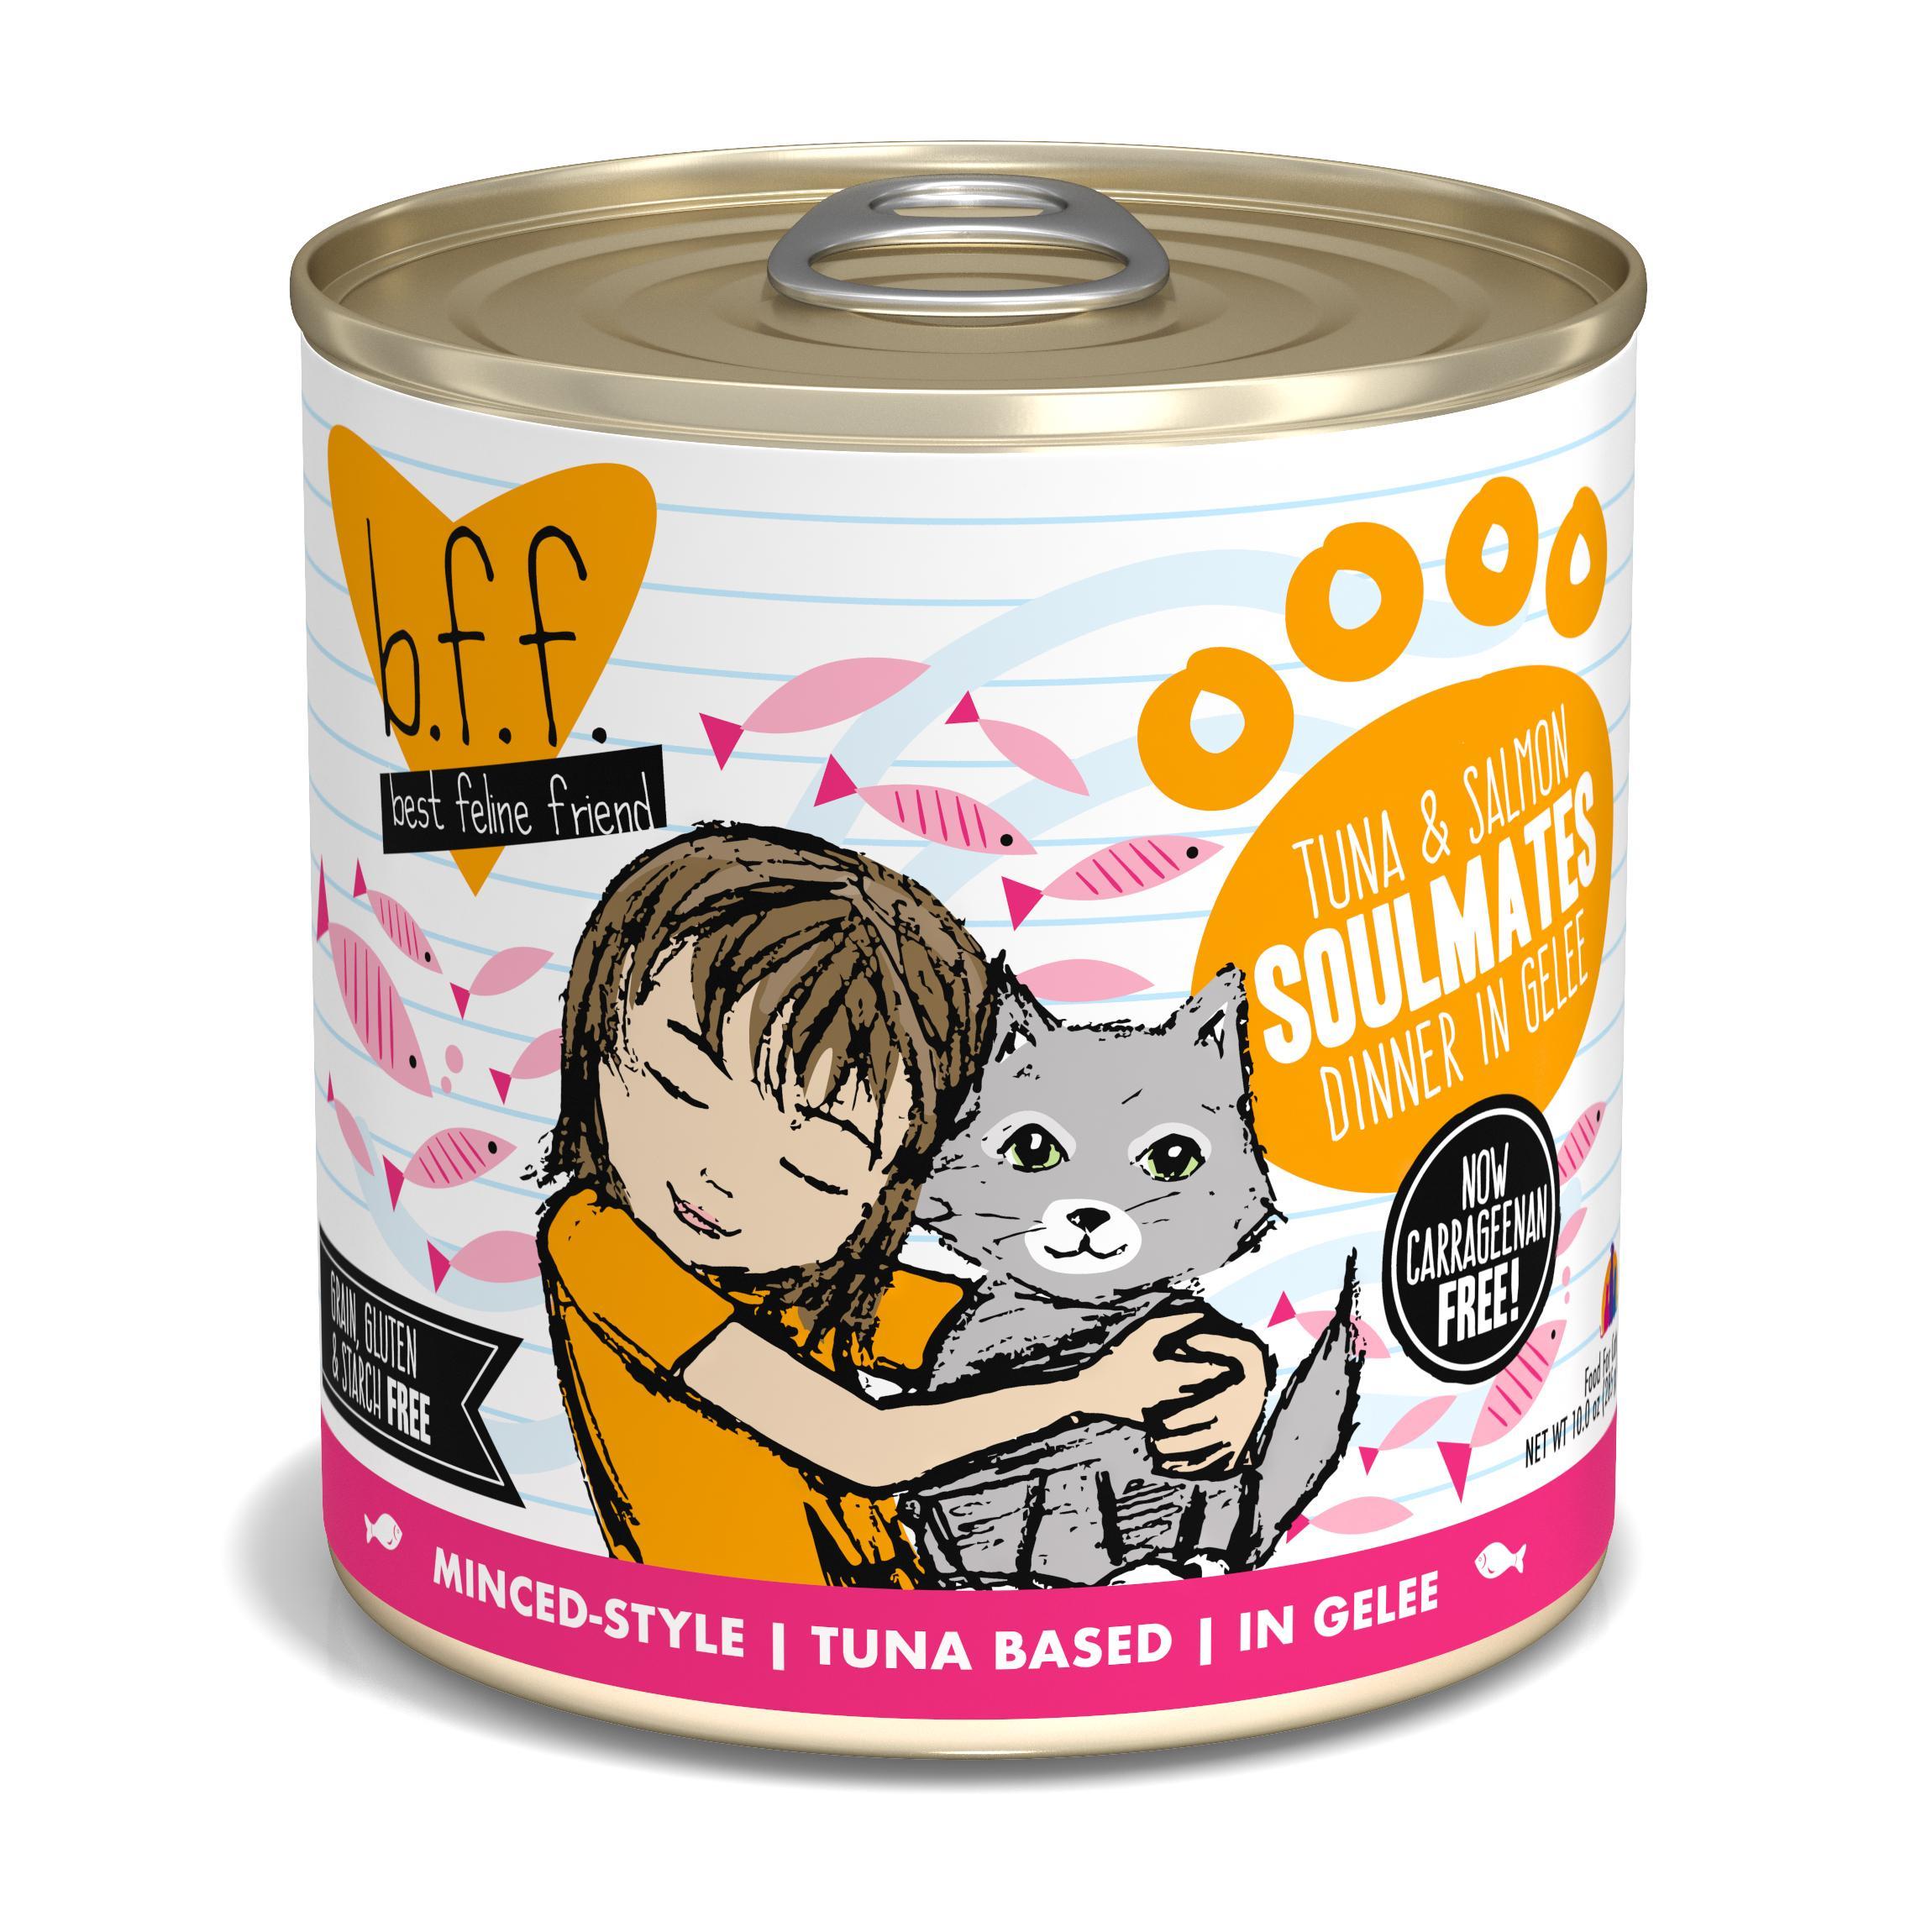 BFF Originals Soulmates Tuna & Salmon Dinner in Gelee Grain-Free Wet Cat Food, 10-oz